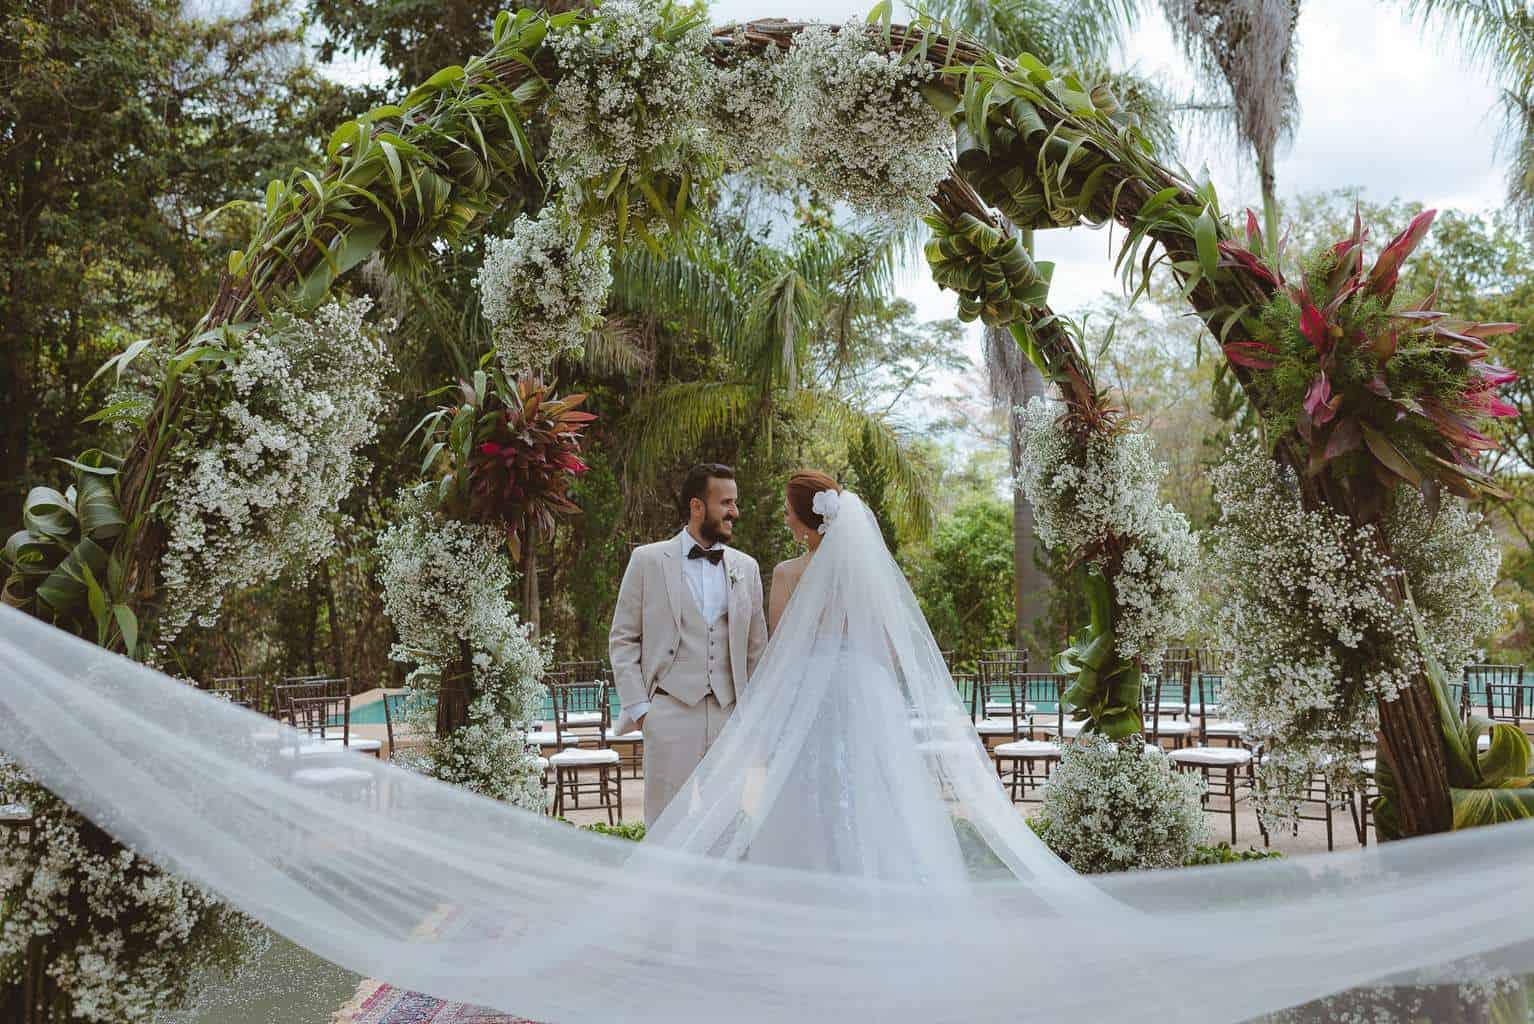 casamento-ao-ar-livre-casamento-boho-casamento-geek-casamento-rustico-casamento-Thais-e-Pedro-noivos-Revoar-Fotografia-Villa-Borghese-Eventos-37